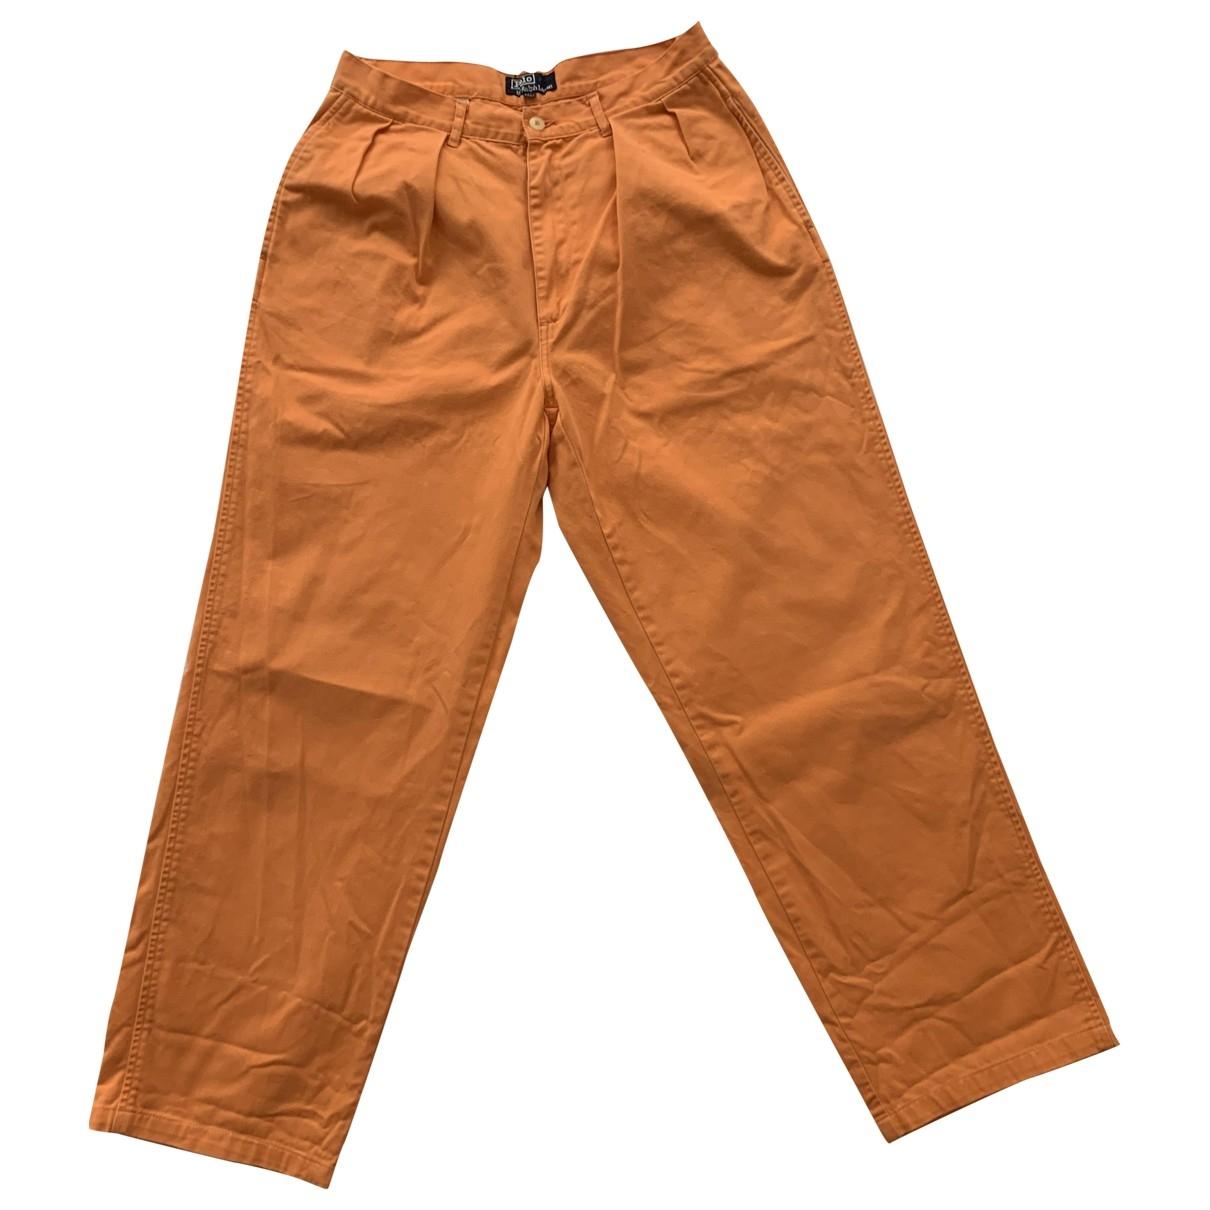 Polo Ralph Lauren \N Orange Cotton Trousers for Men 32 UK - US